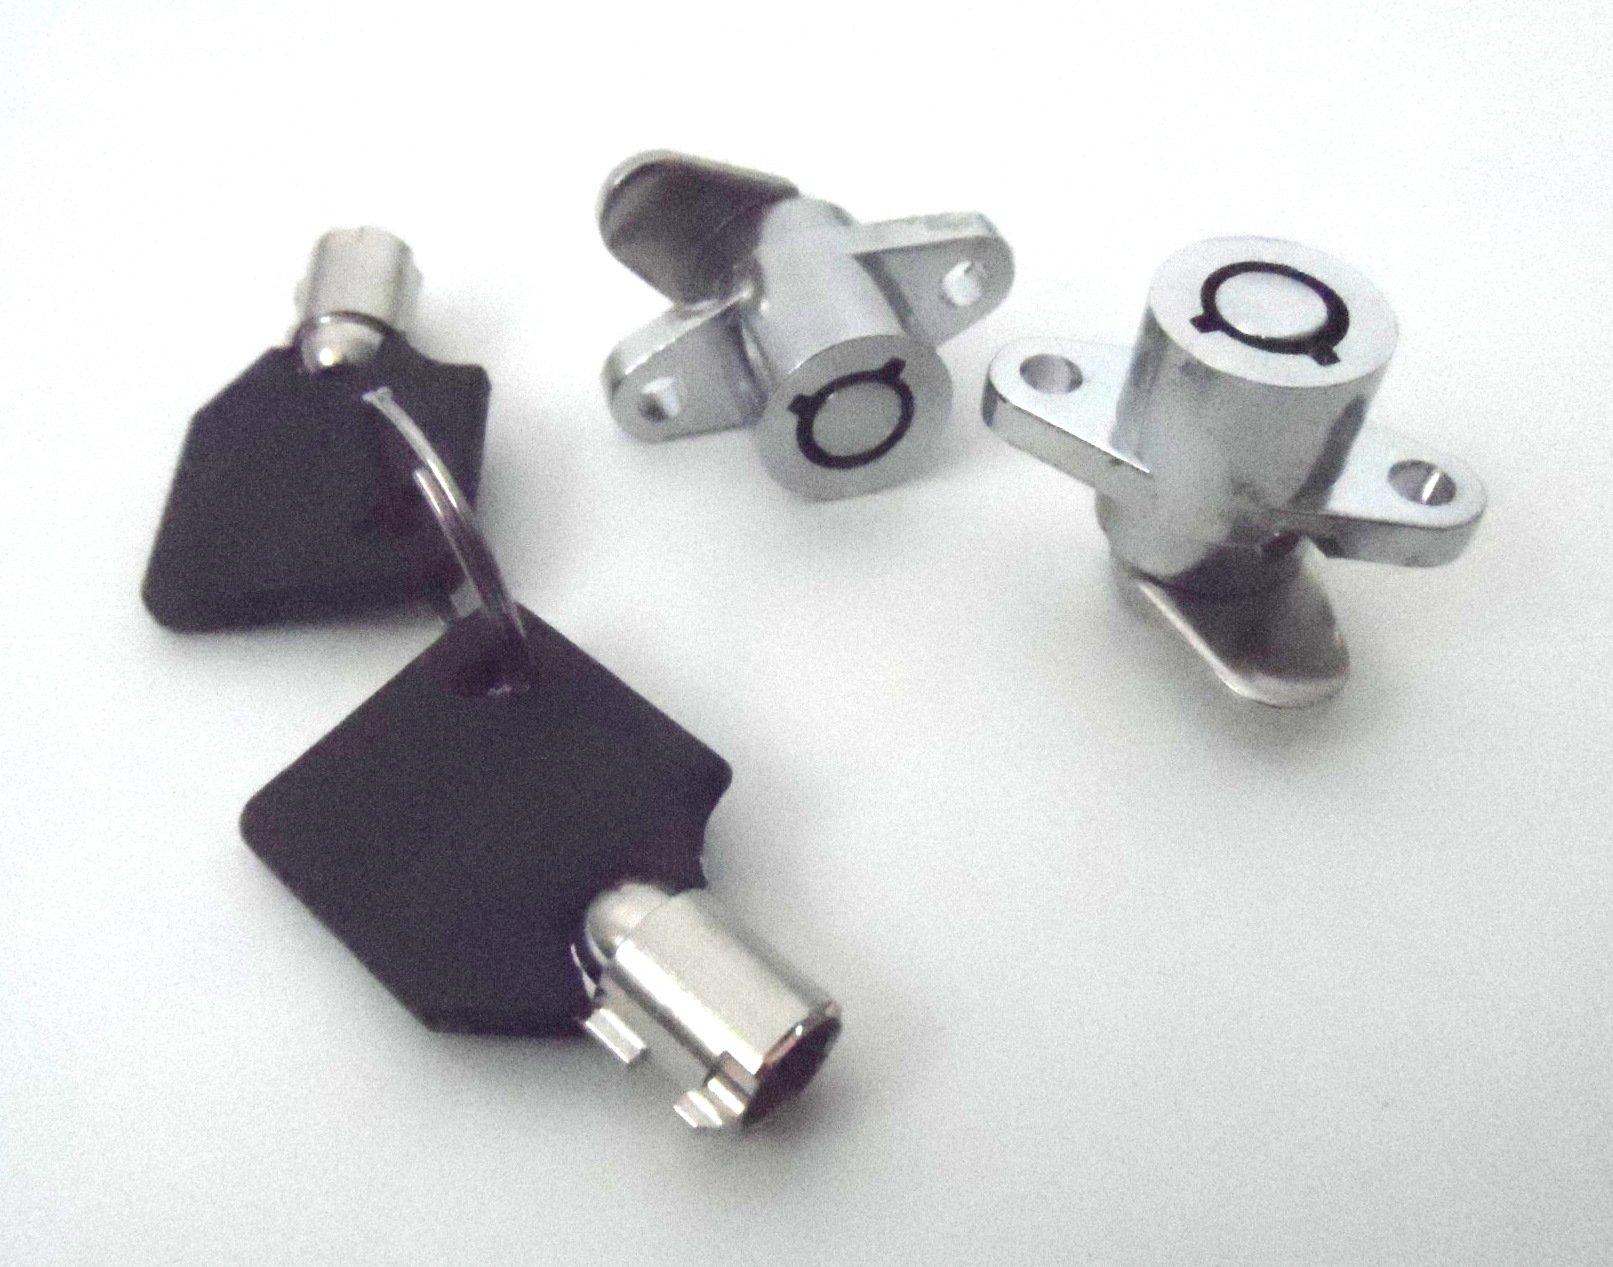 Saddlebag Lock Set for Harley-Davidson 1993-2013 Touring Models Saddlebag Locks Direct Replacement for OEM Hard Bag Locks